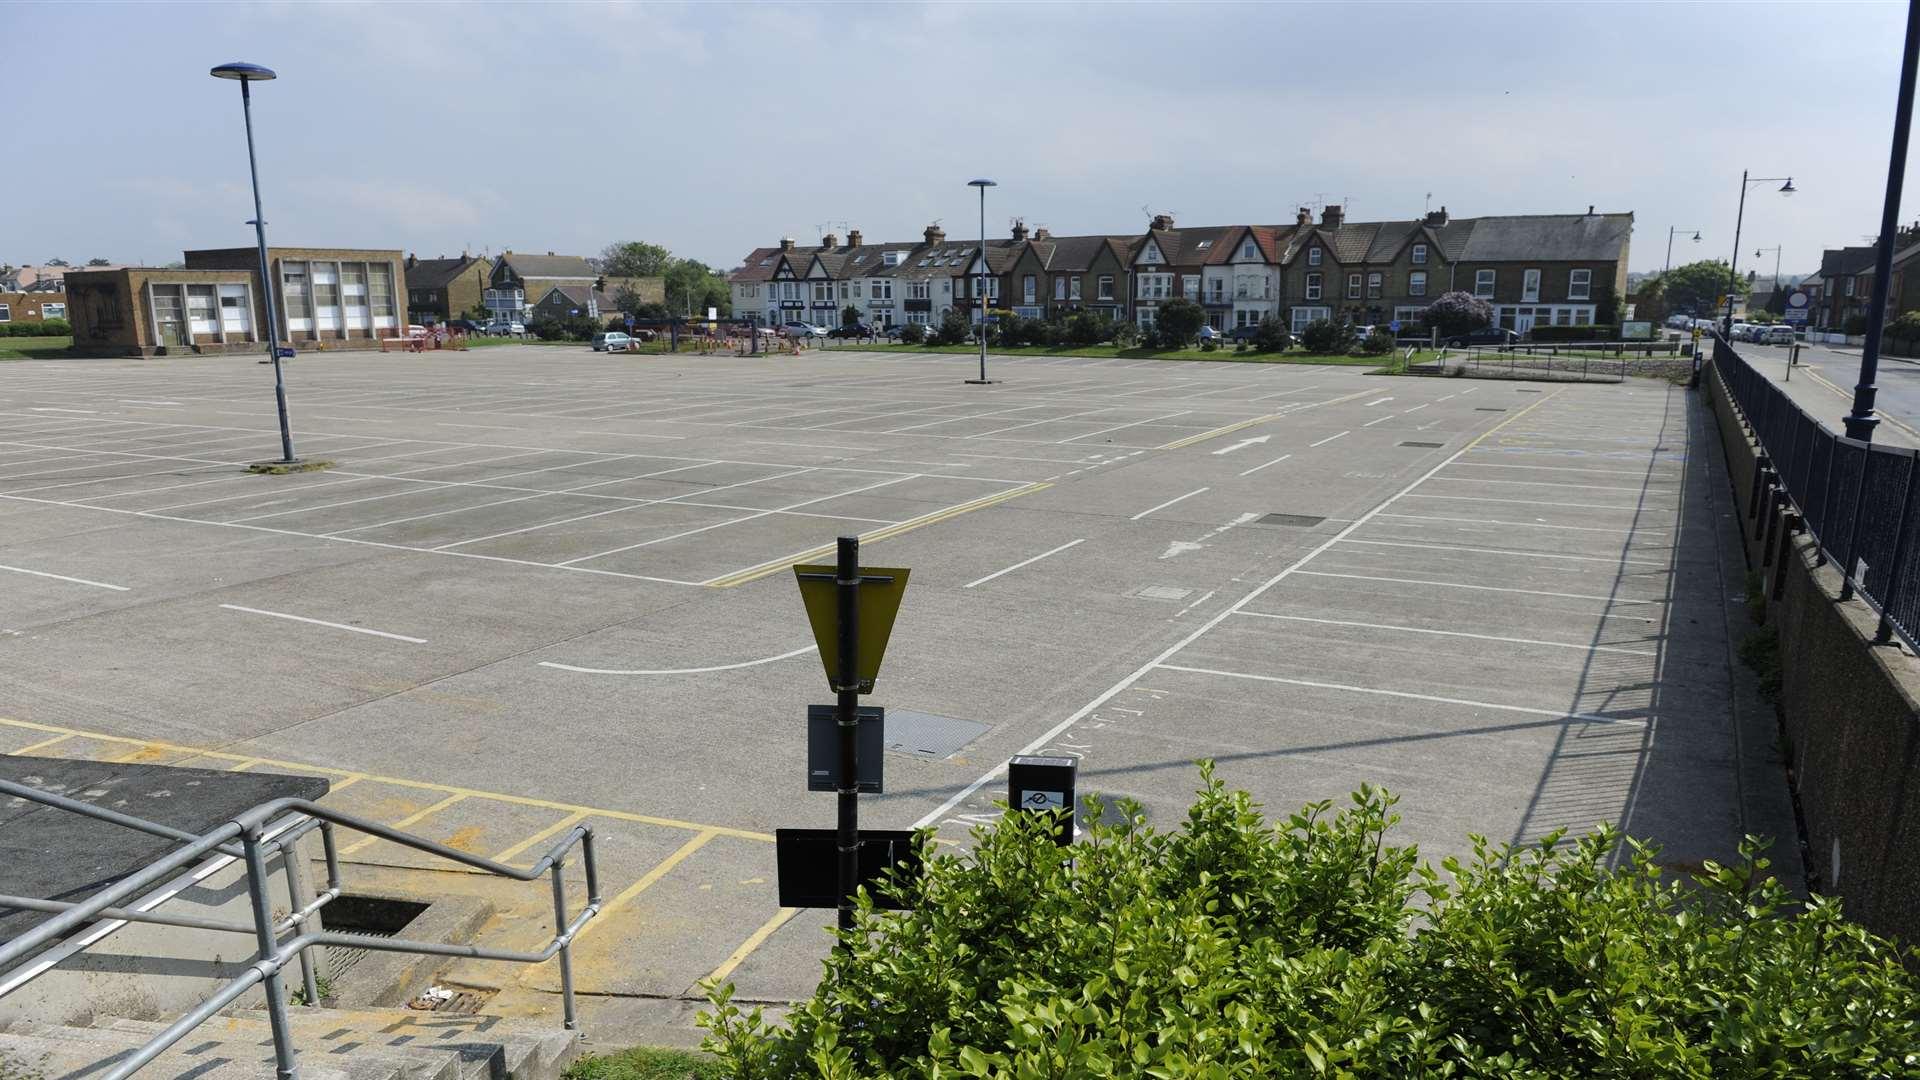 Station Road West Car Park Canterbury